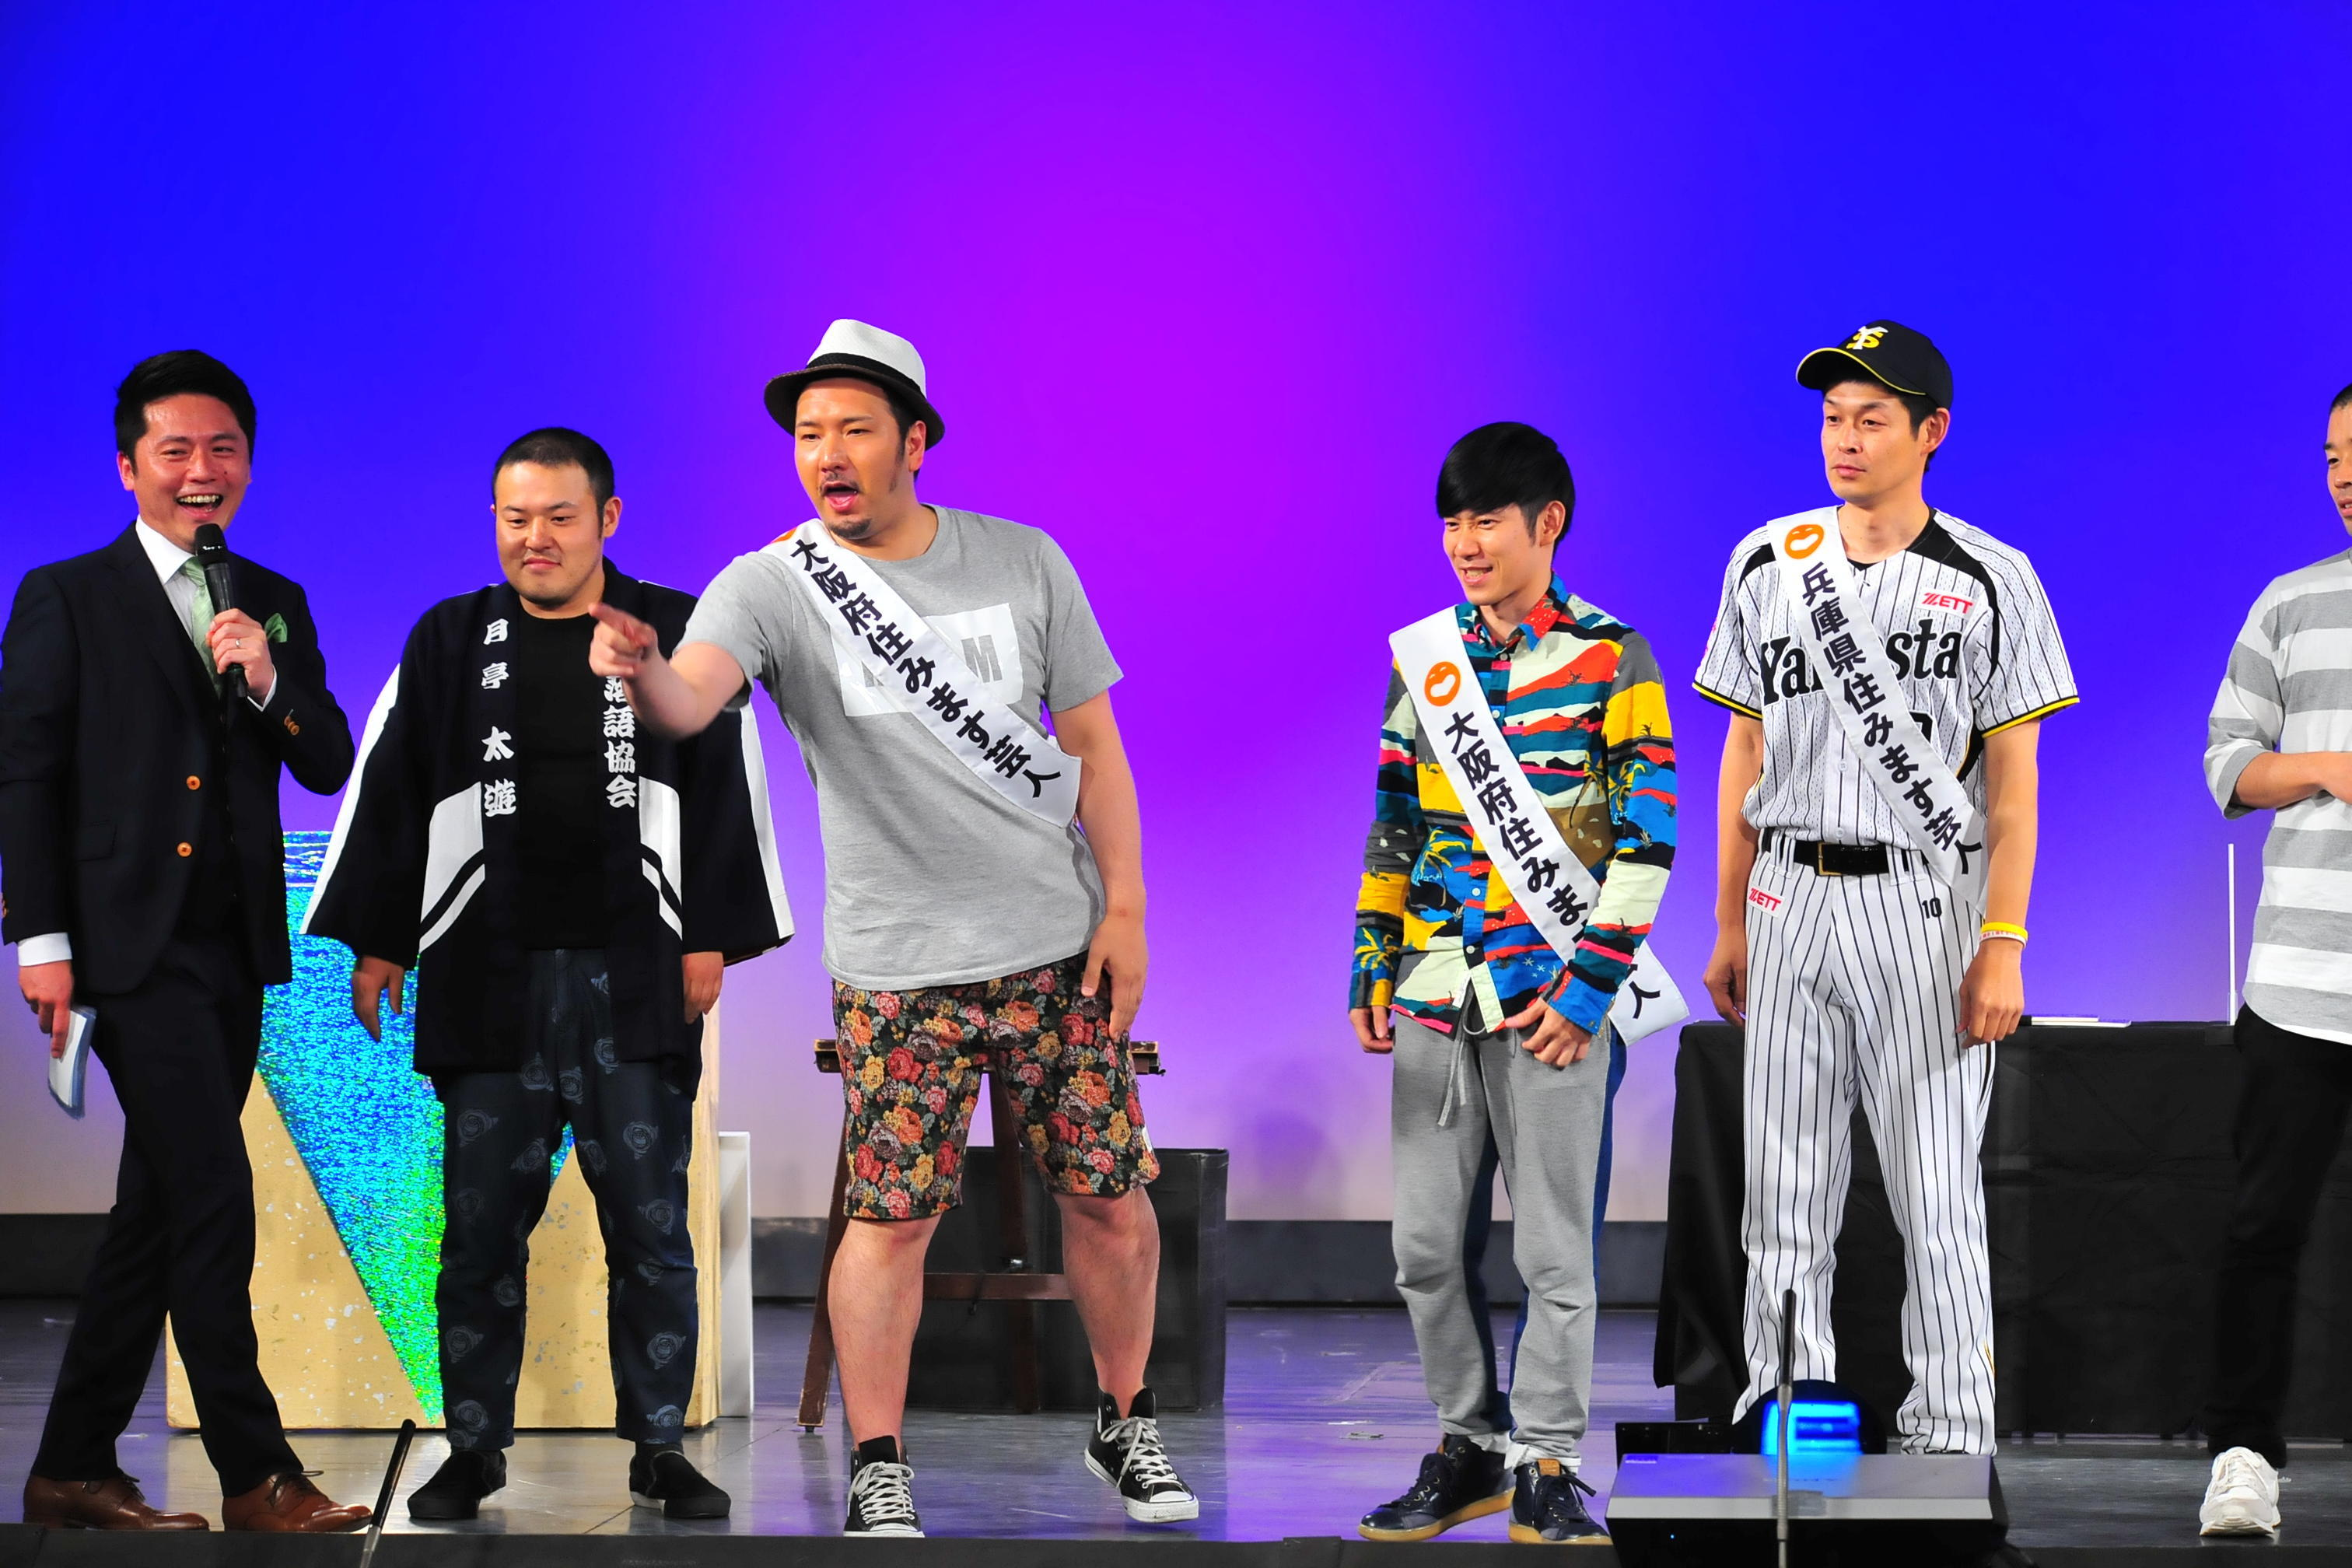 http://news.yoshimoto.co.jp/20160516144233-92b8635b2761212efeacf68ecc2e7d5857ced780.jpg